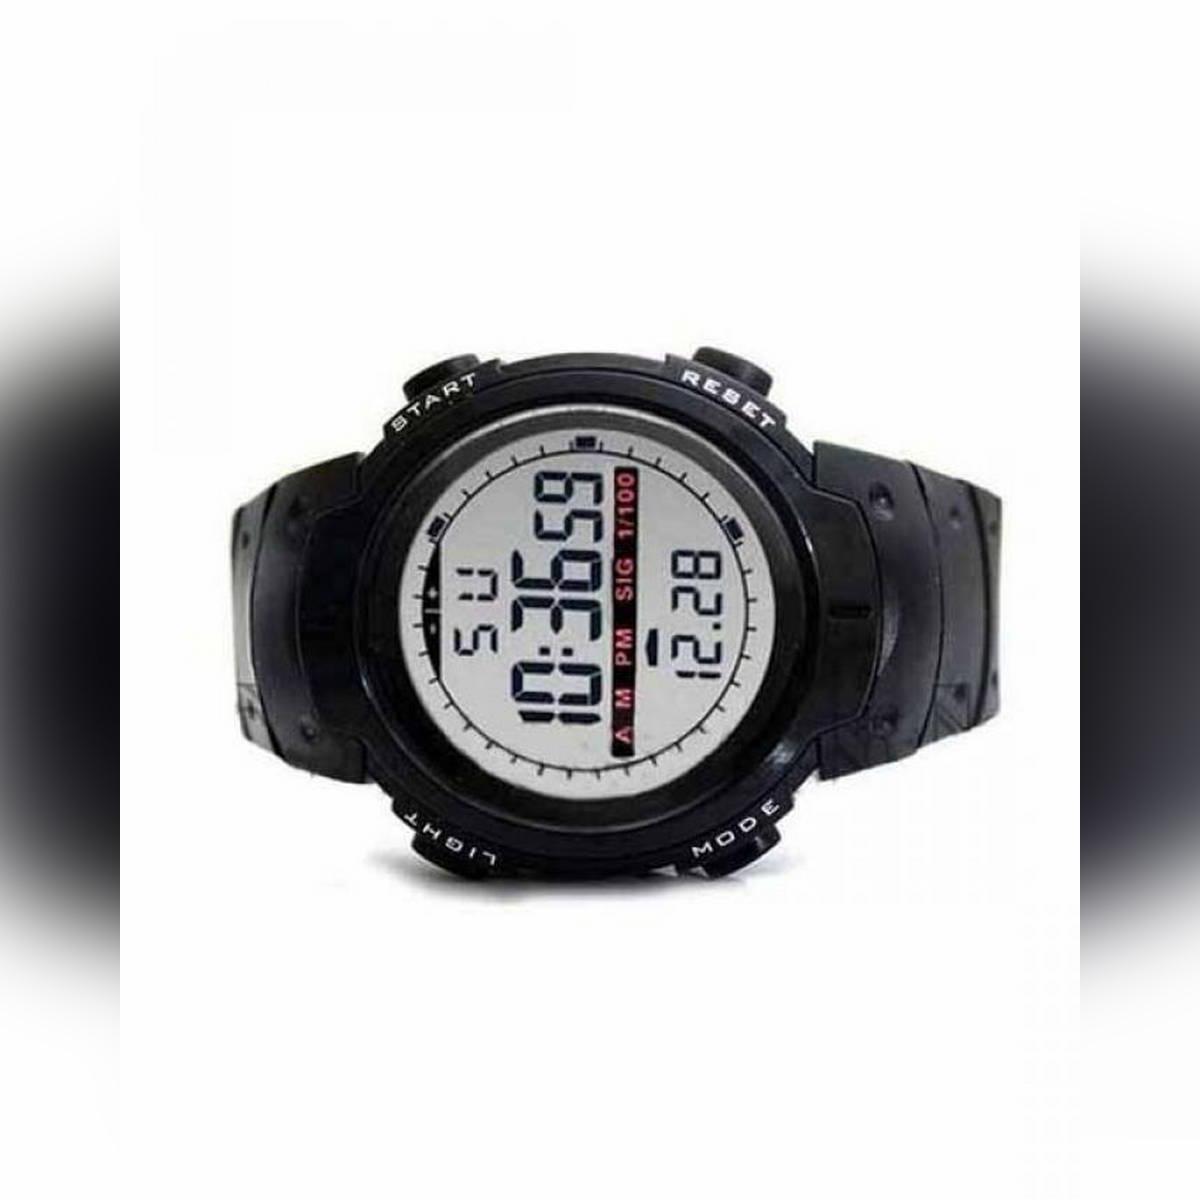 Digital Alarm Watch for Men with Night Mode Light - Black